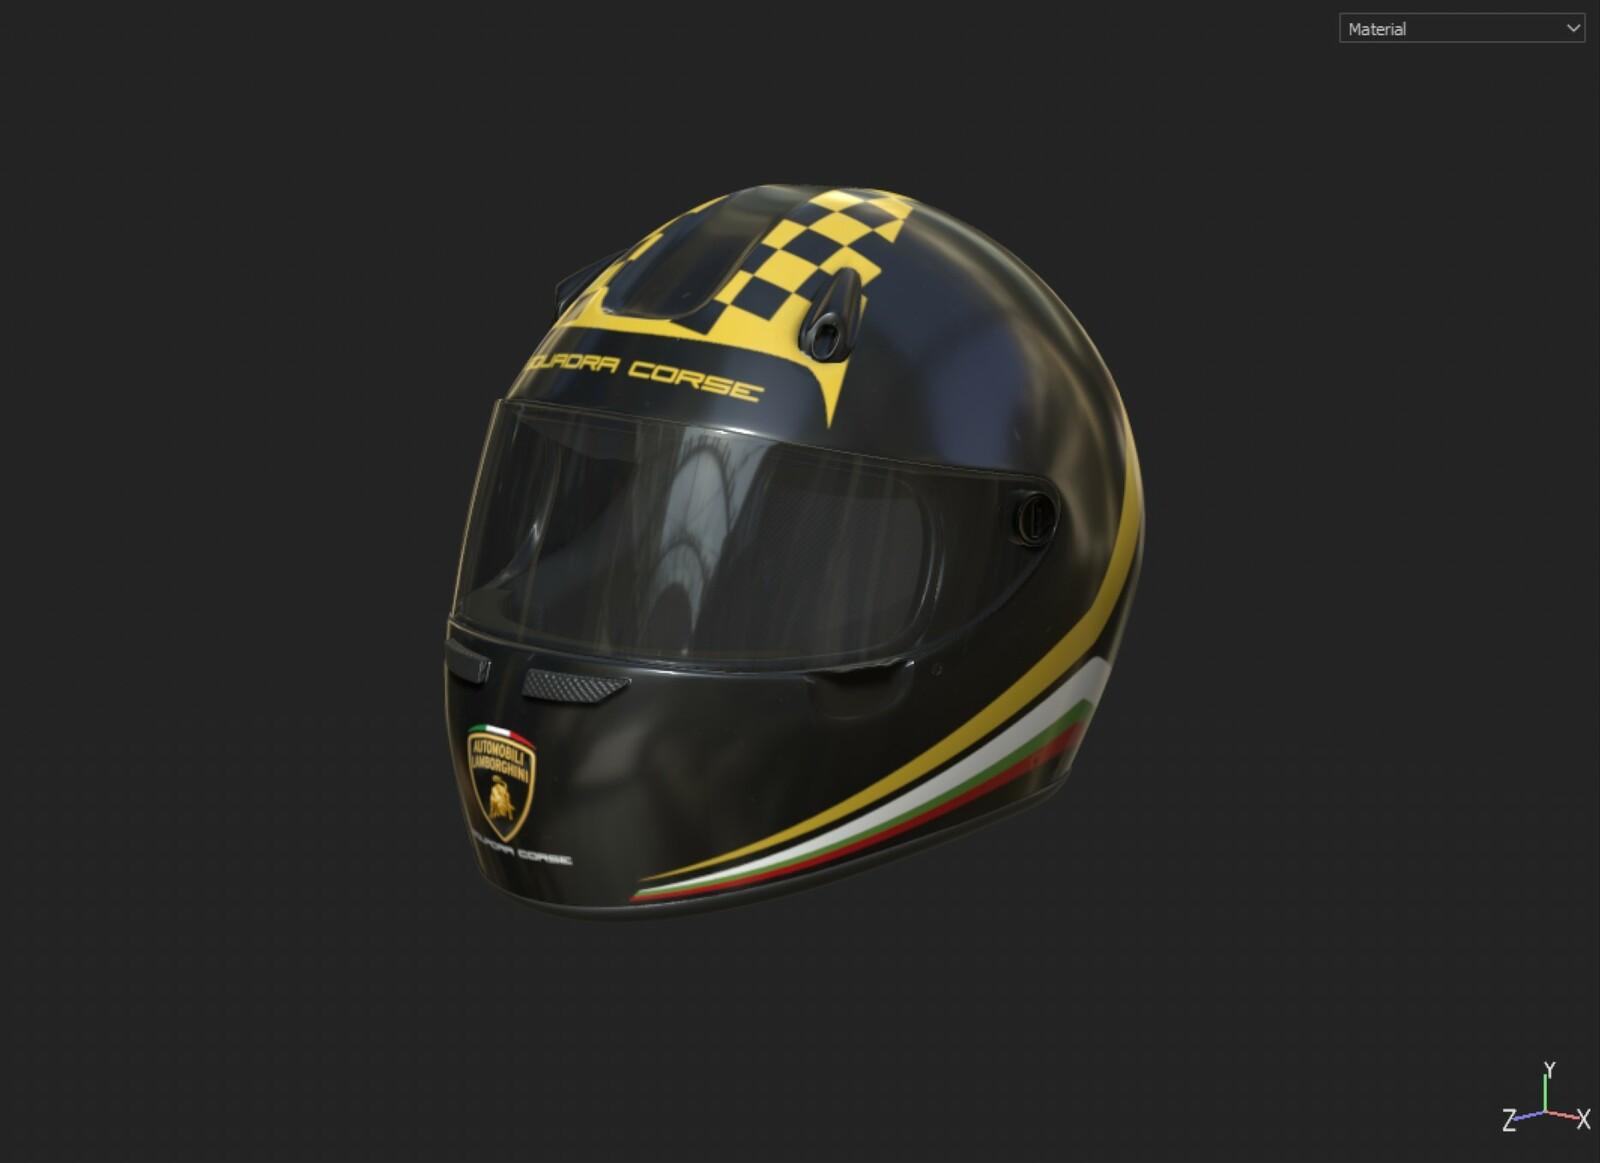 Lamborghini Squadra Corse Helmet